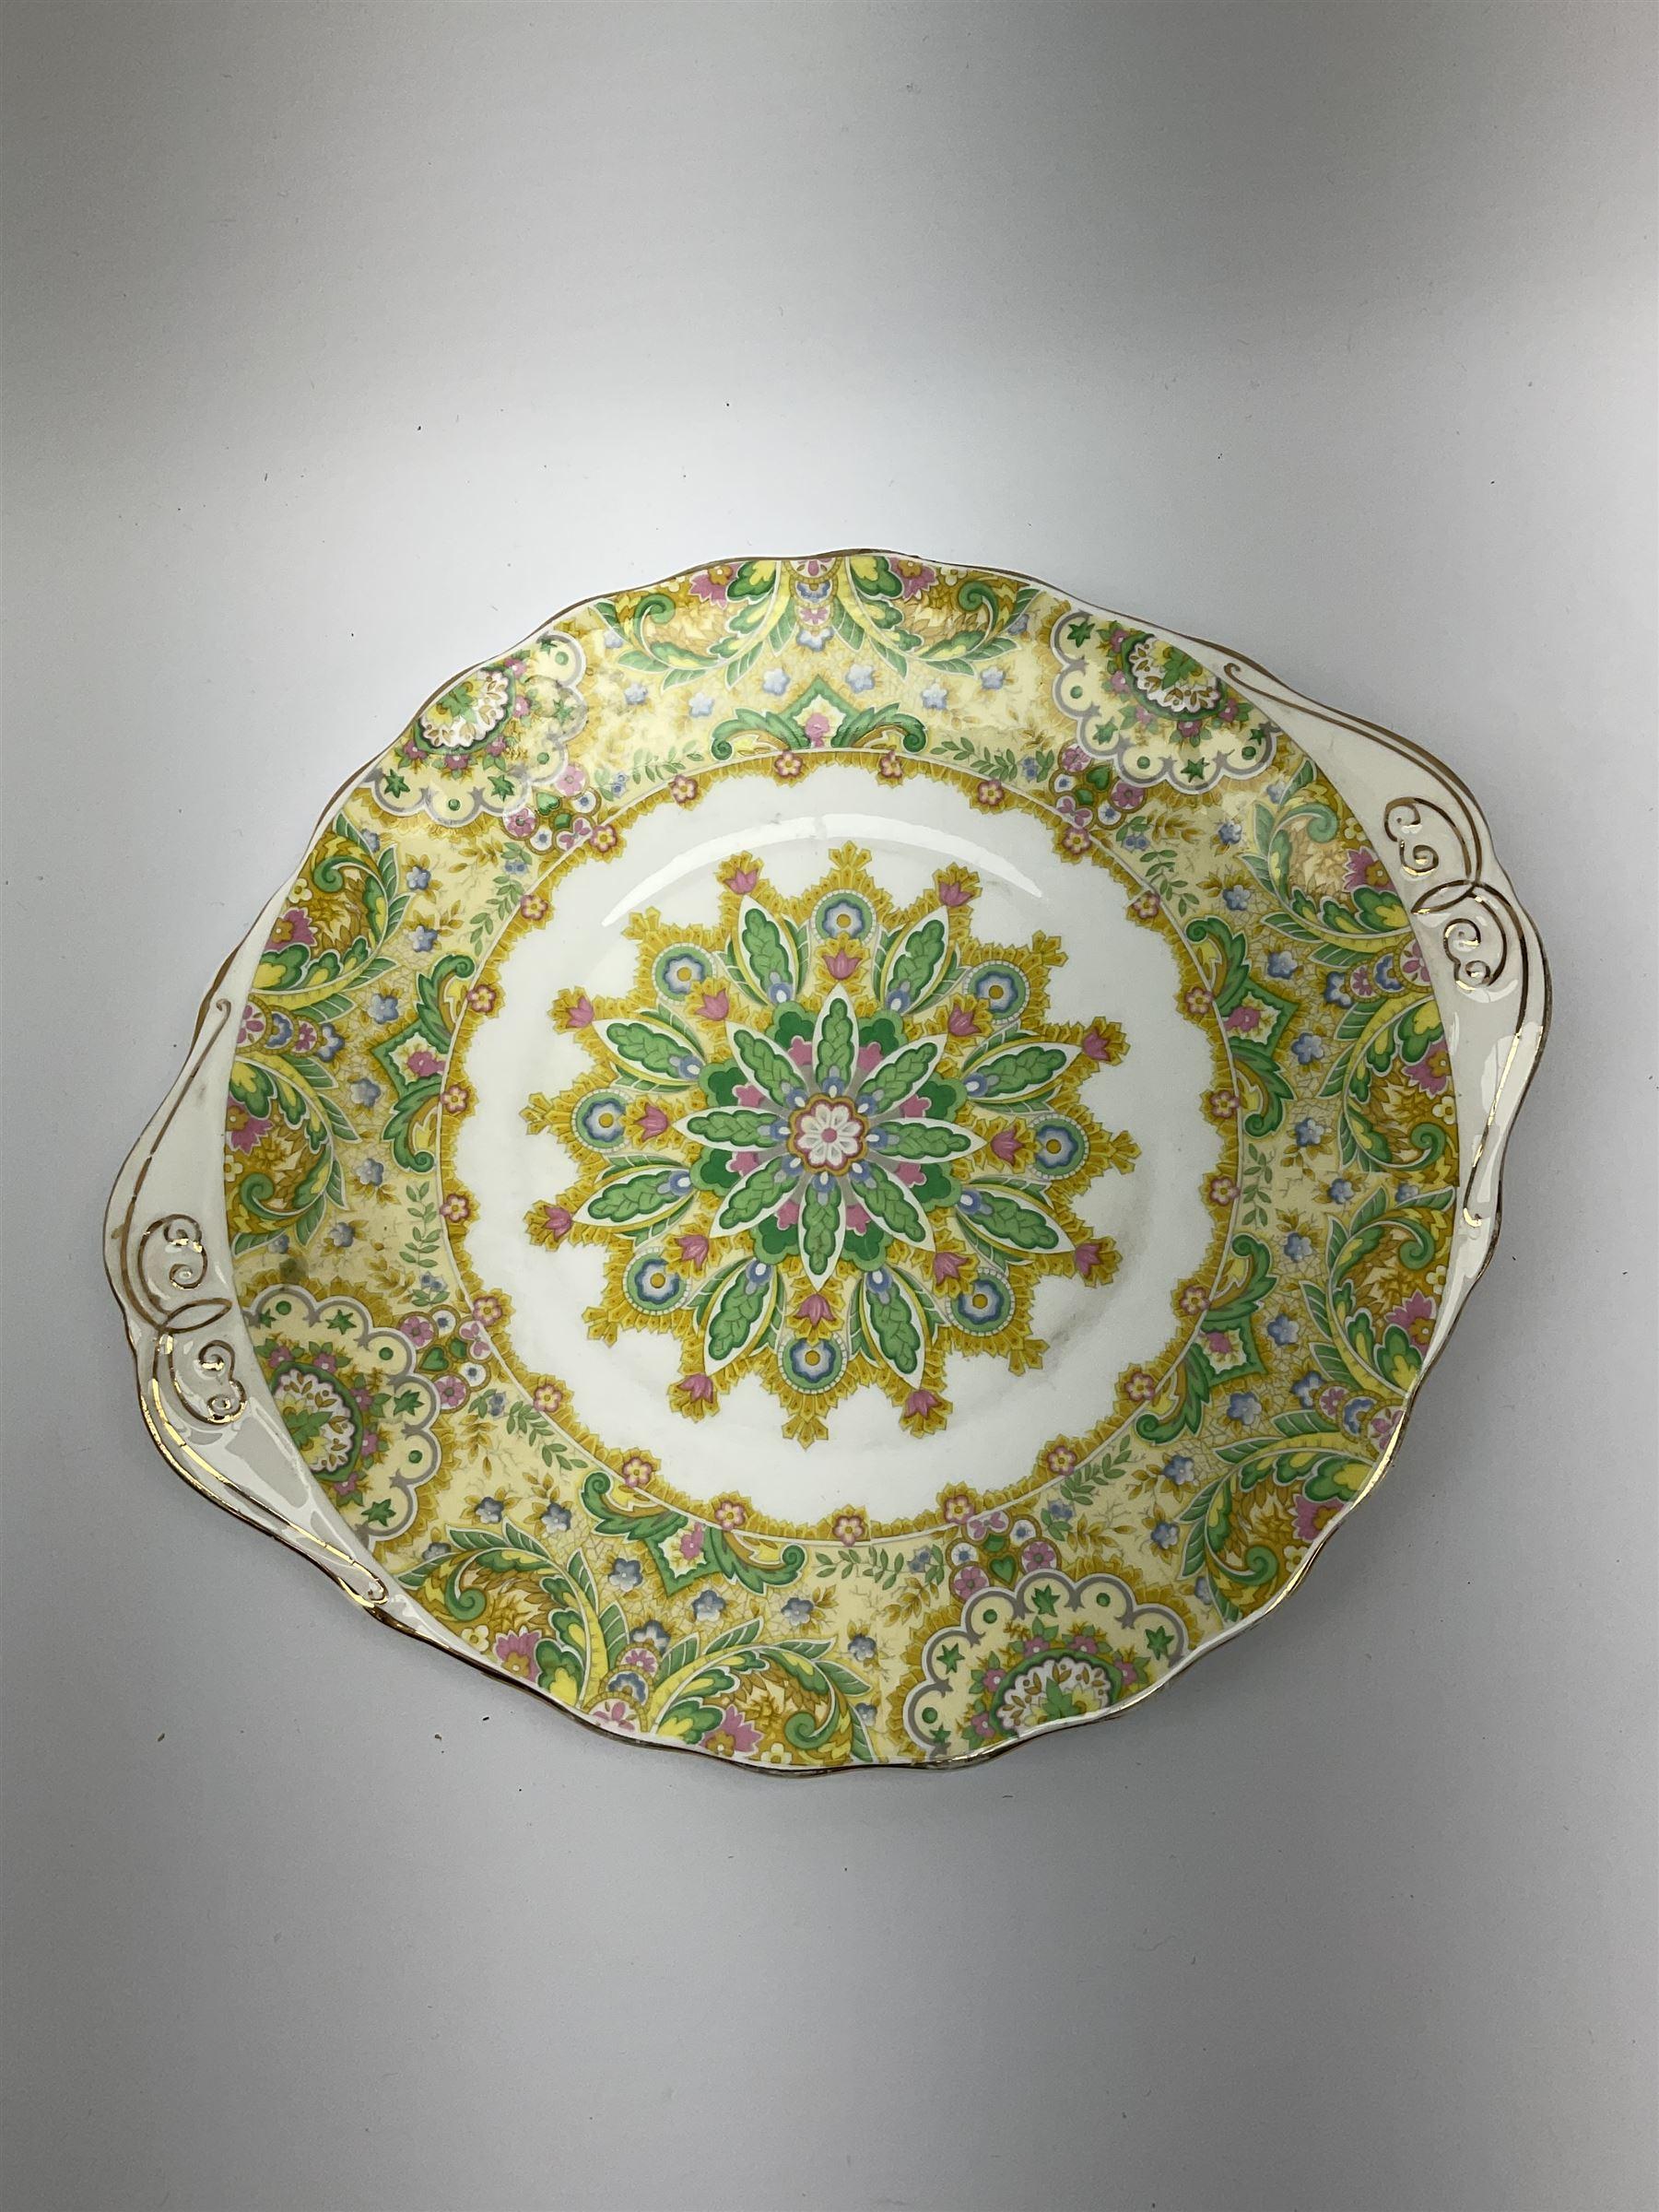 Royal Albert 'Paisley Shawl' pattern part tea set - Image 2 of 12